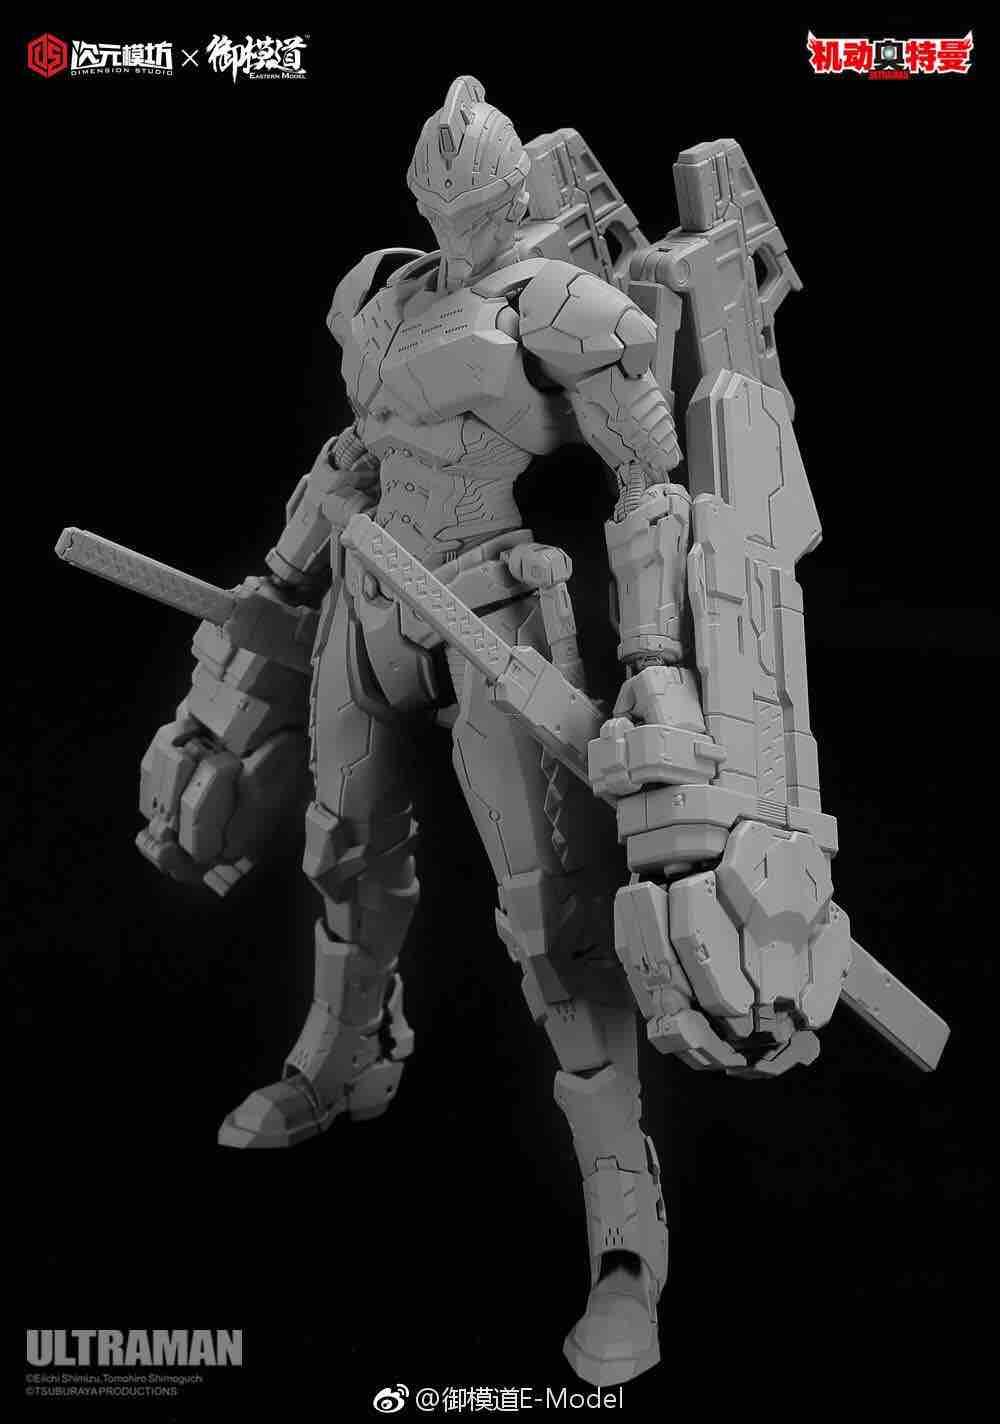 New Product: Dimension Studio x Model Principle Ultraman figures and model kits! 44eab410